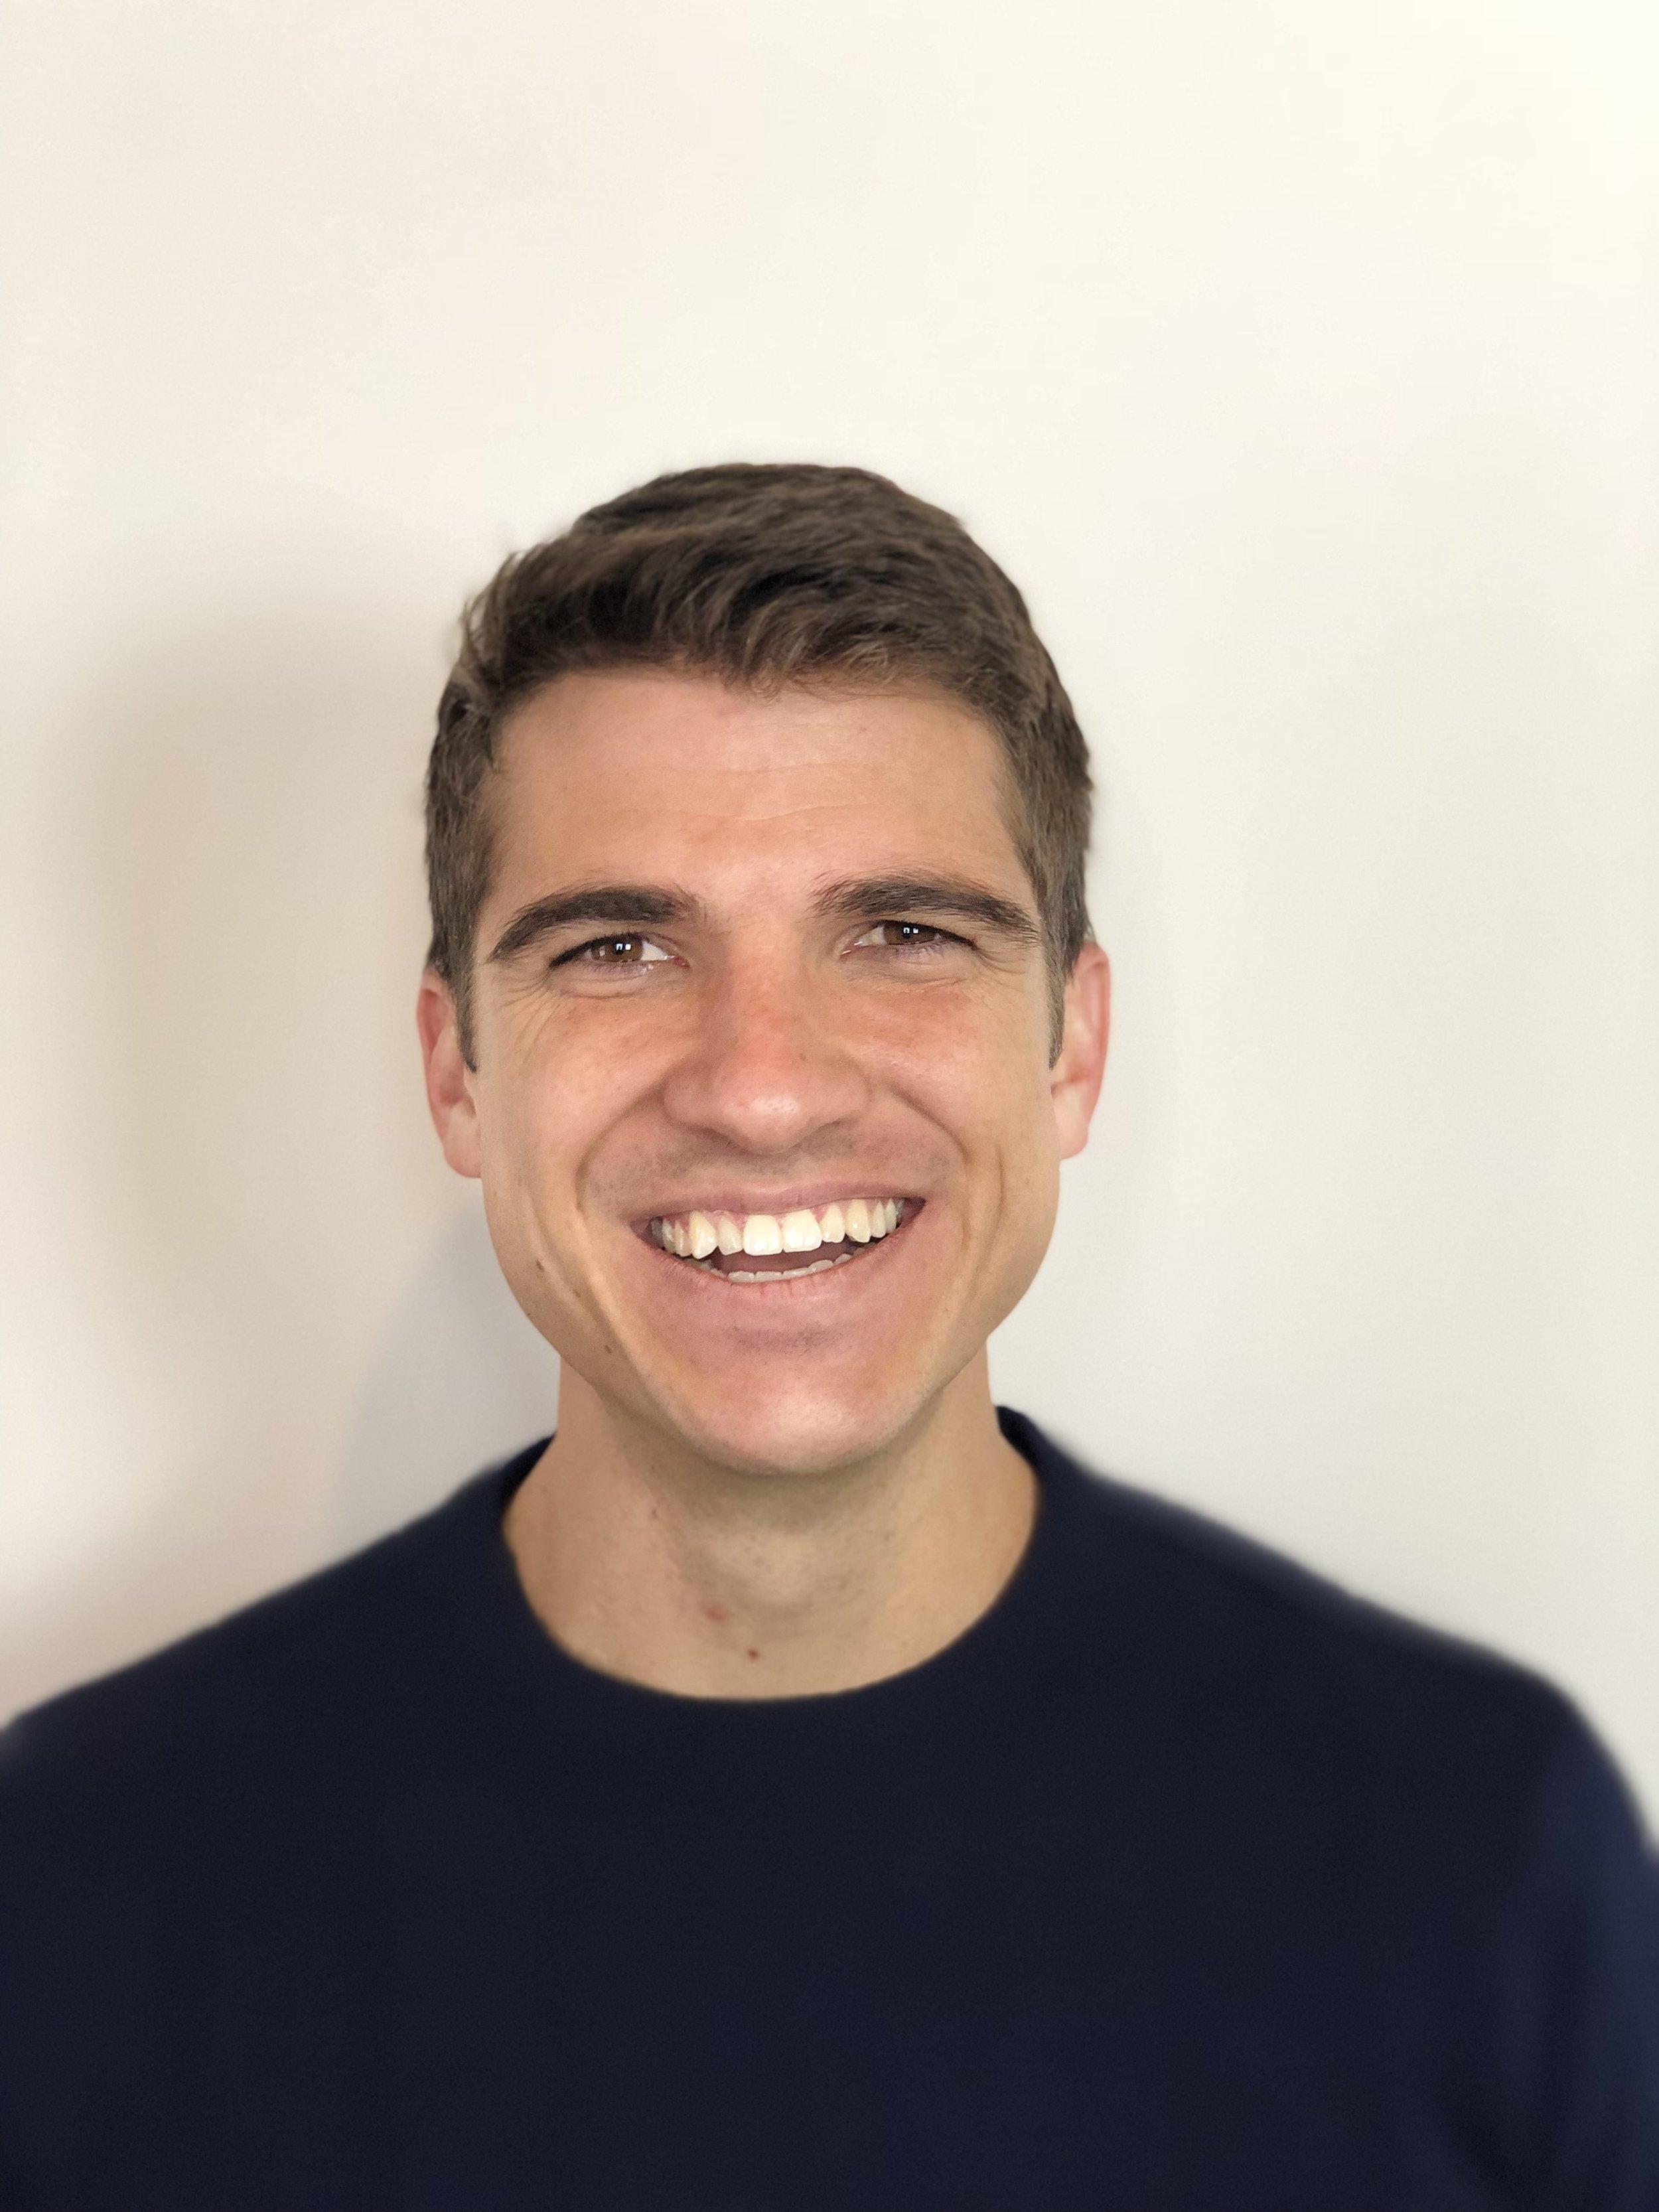 James Rathmann | Lead Pastor